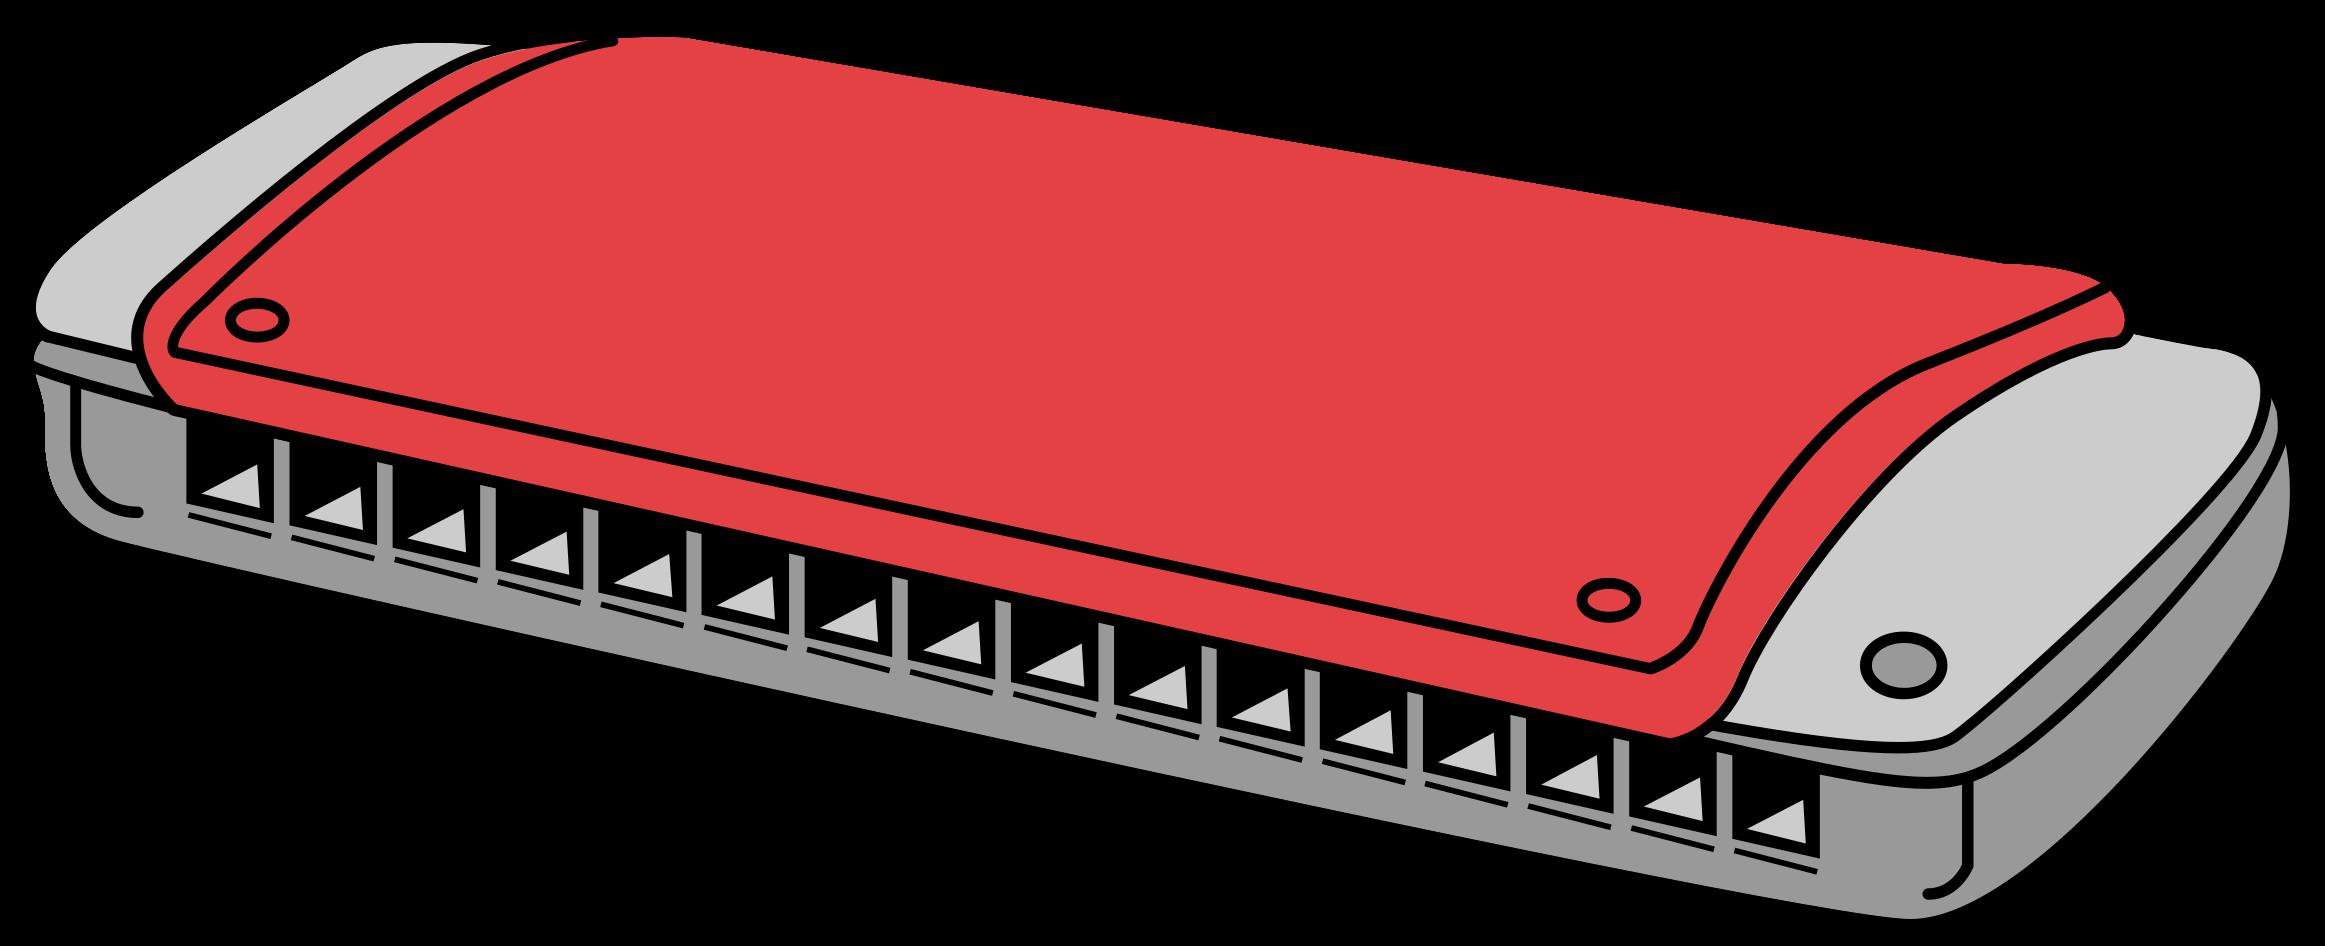 Music instrument harmonica png